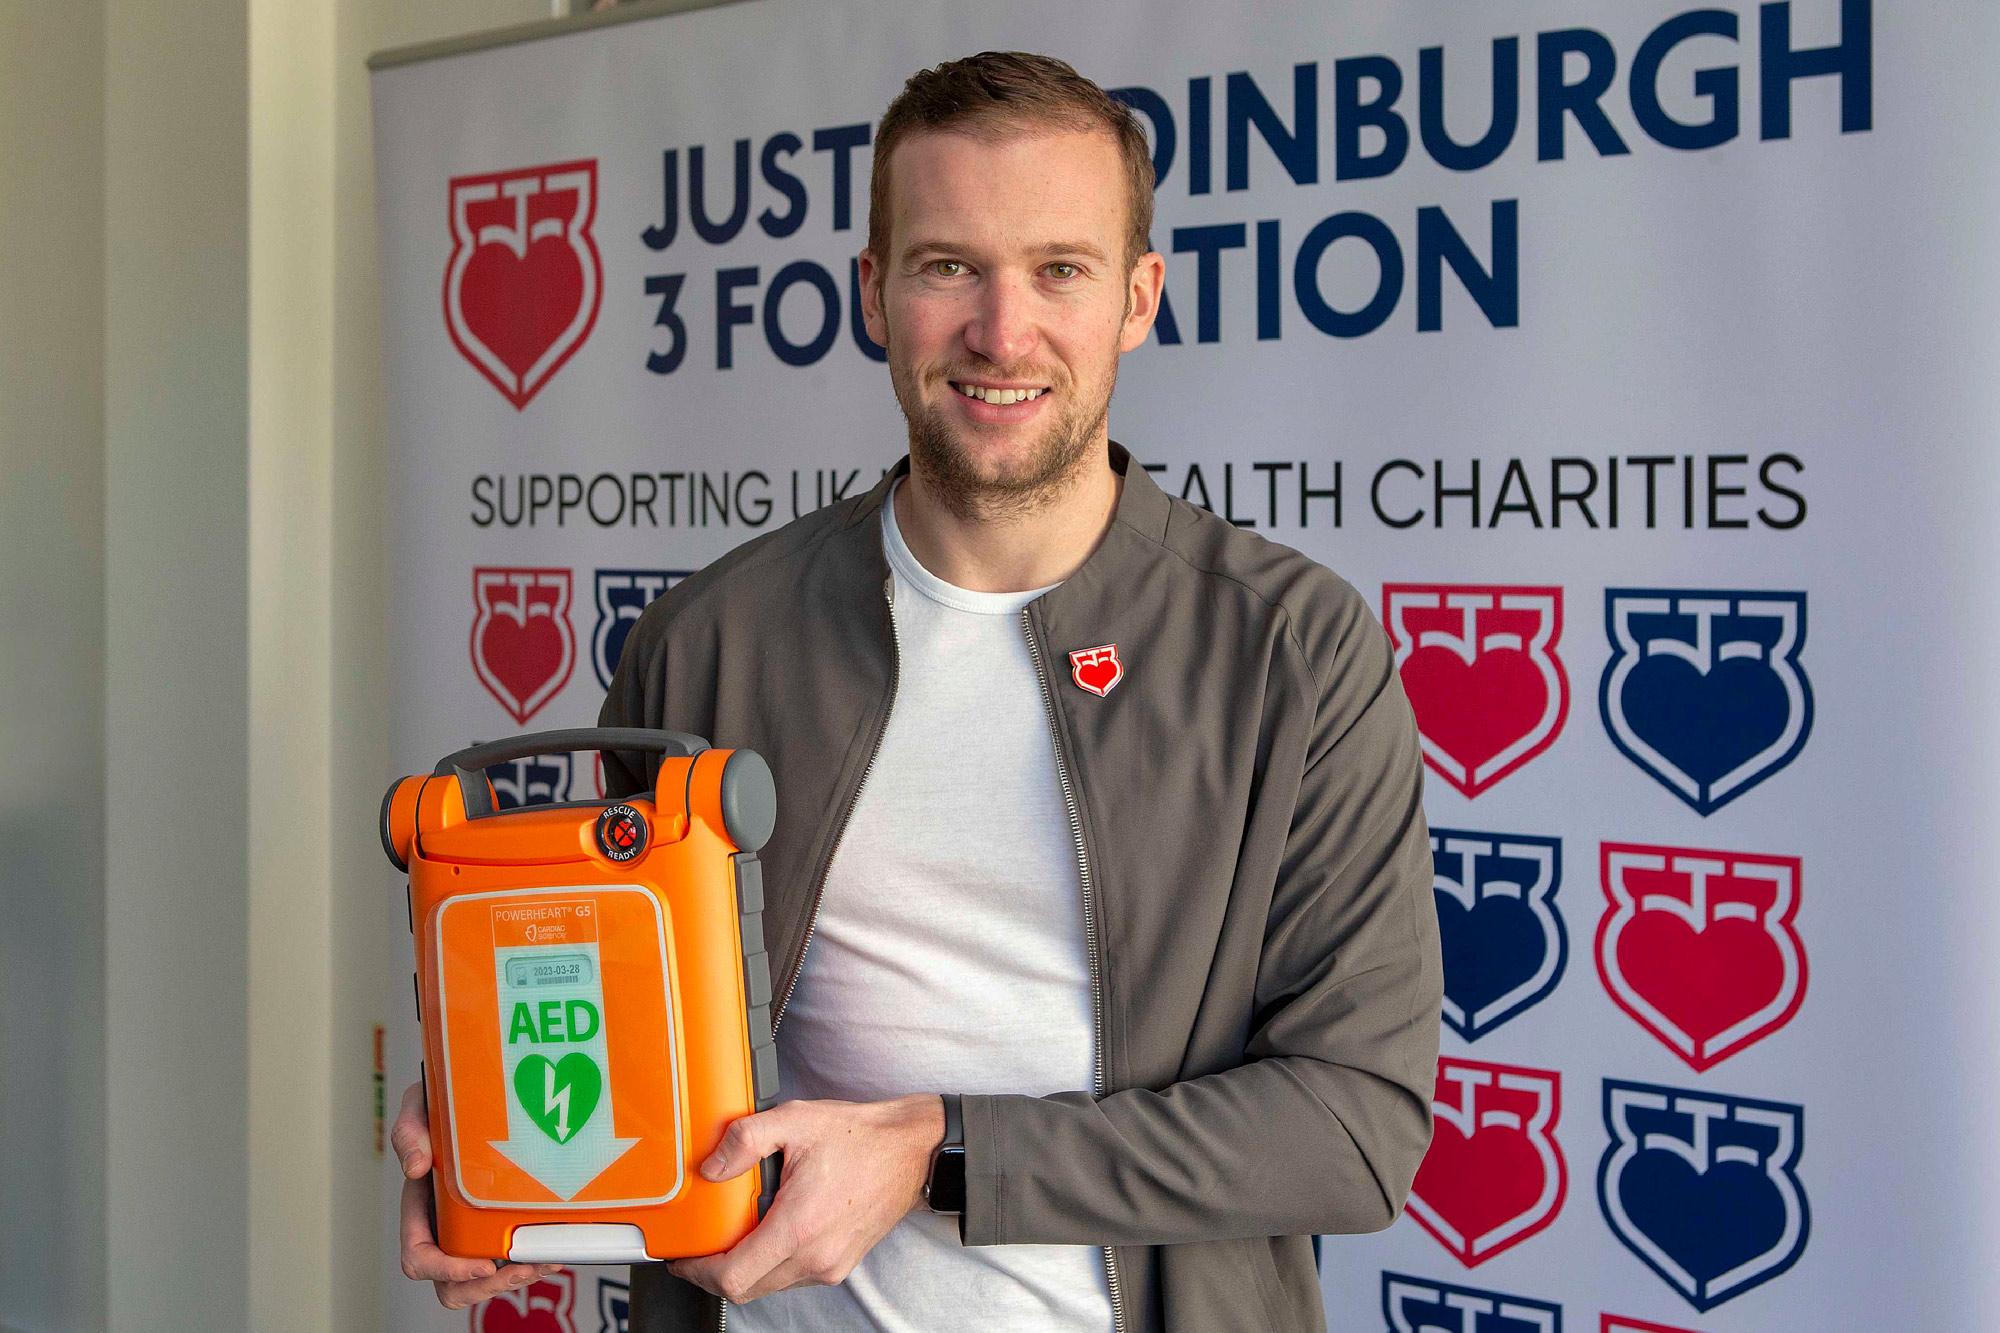 Defibrillator Donations Mark Justin's 51st Birthday